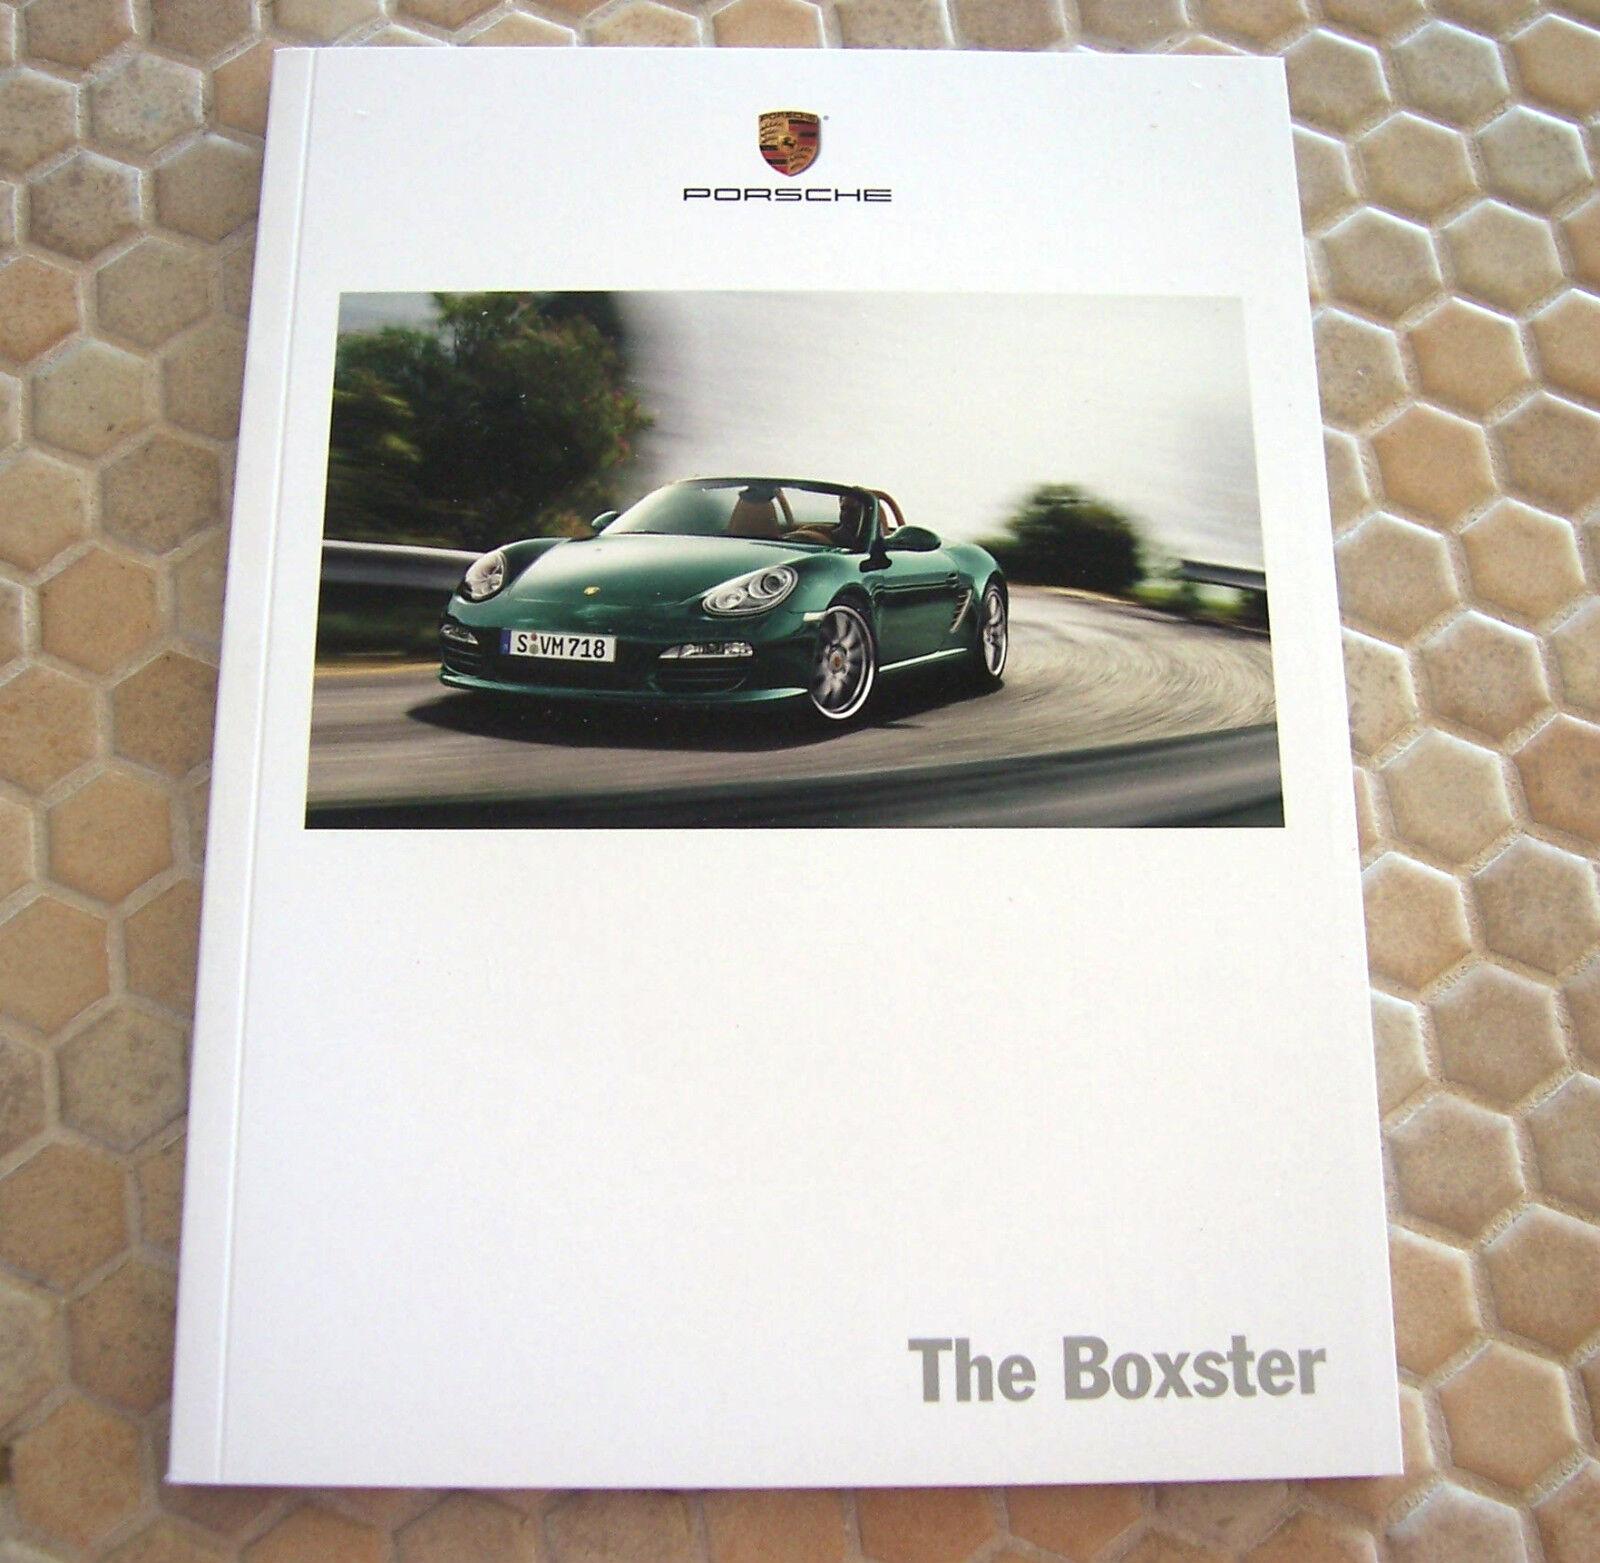 PORSCHE OFFICIAL BOXSTER /& BOXSTER S PRESTIGE SALES BROCHURE 2010 USA EDITION